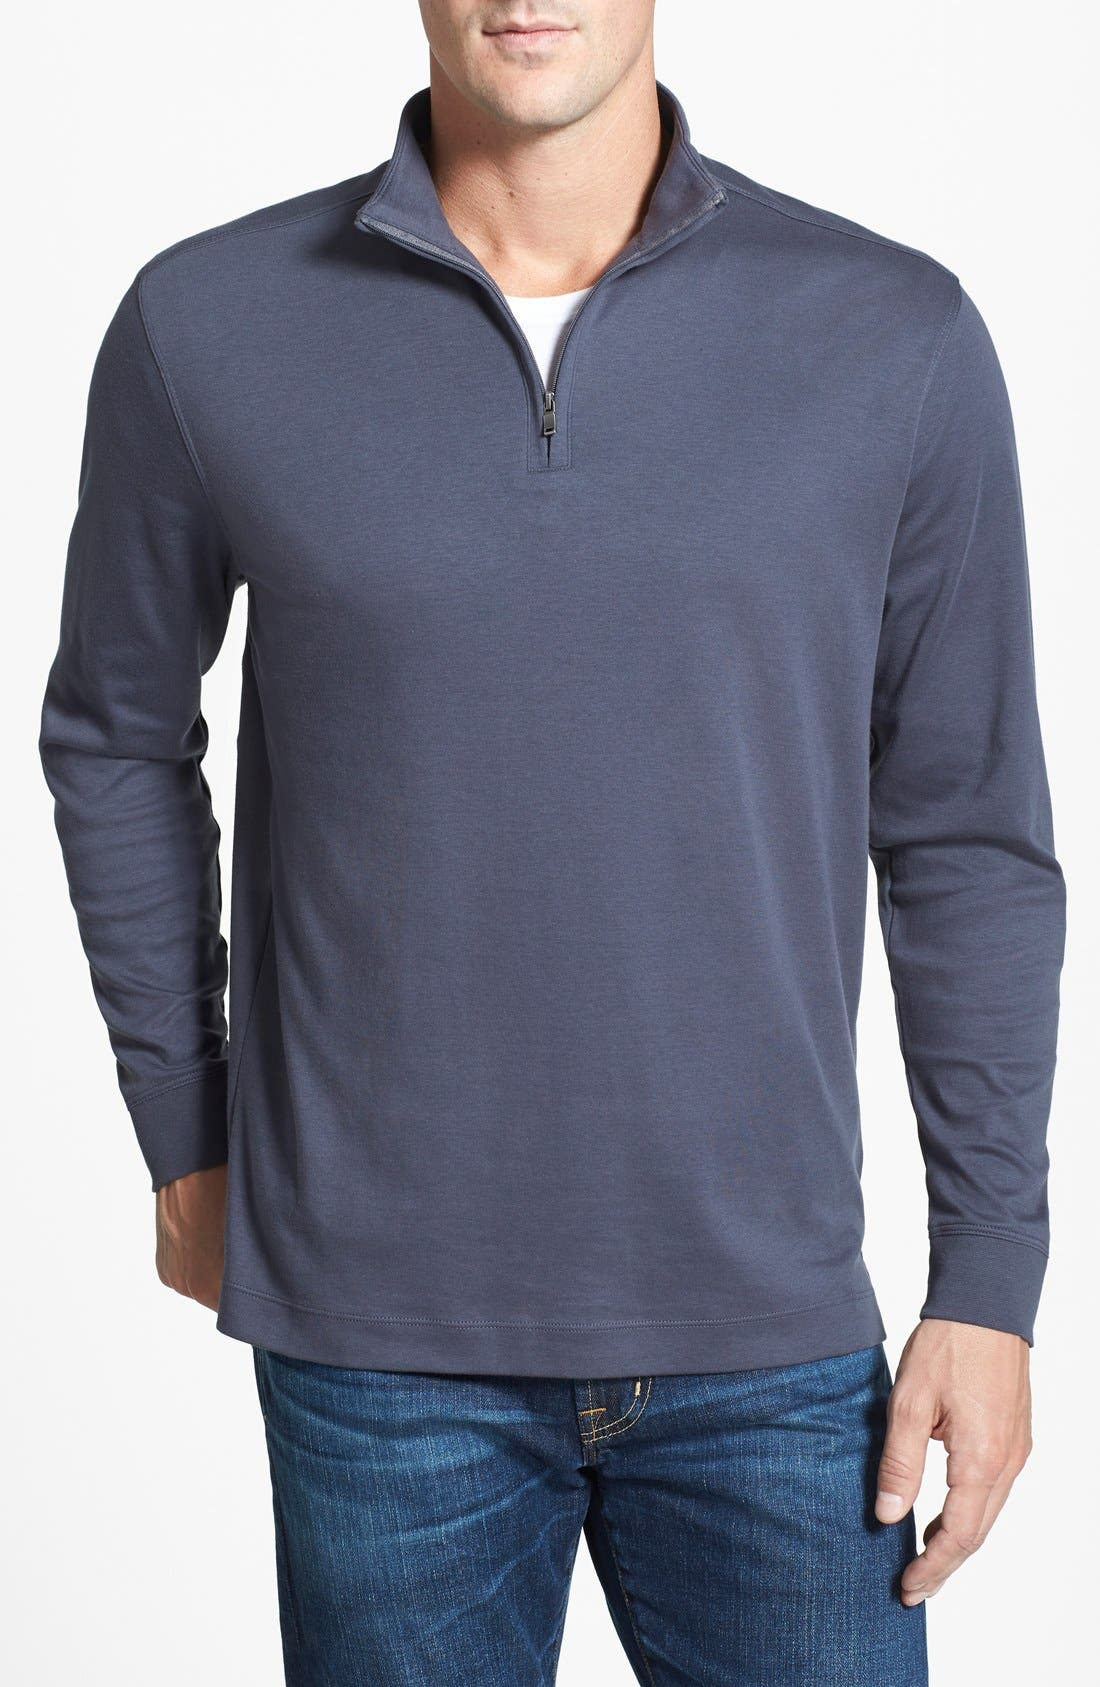 Belfair Quarter Zip Pullover,                             Main thumbnail 1, color,                             Onyx Grey